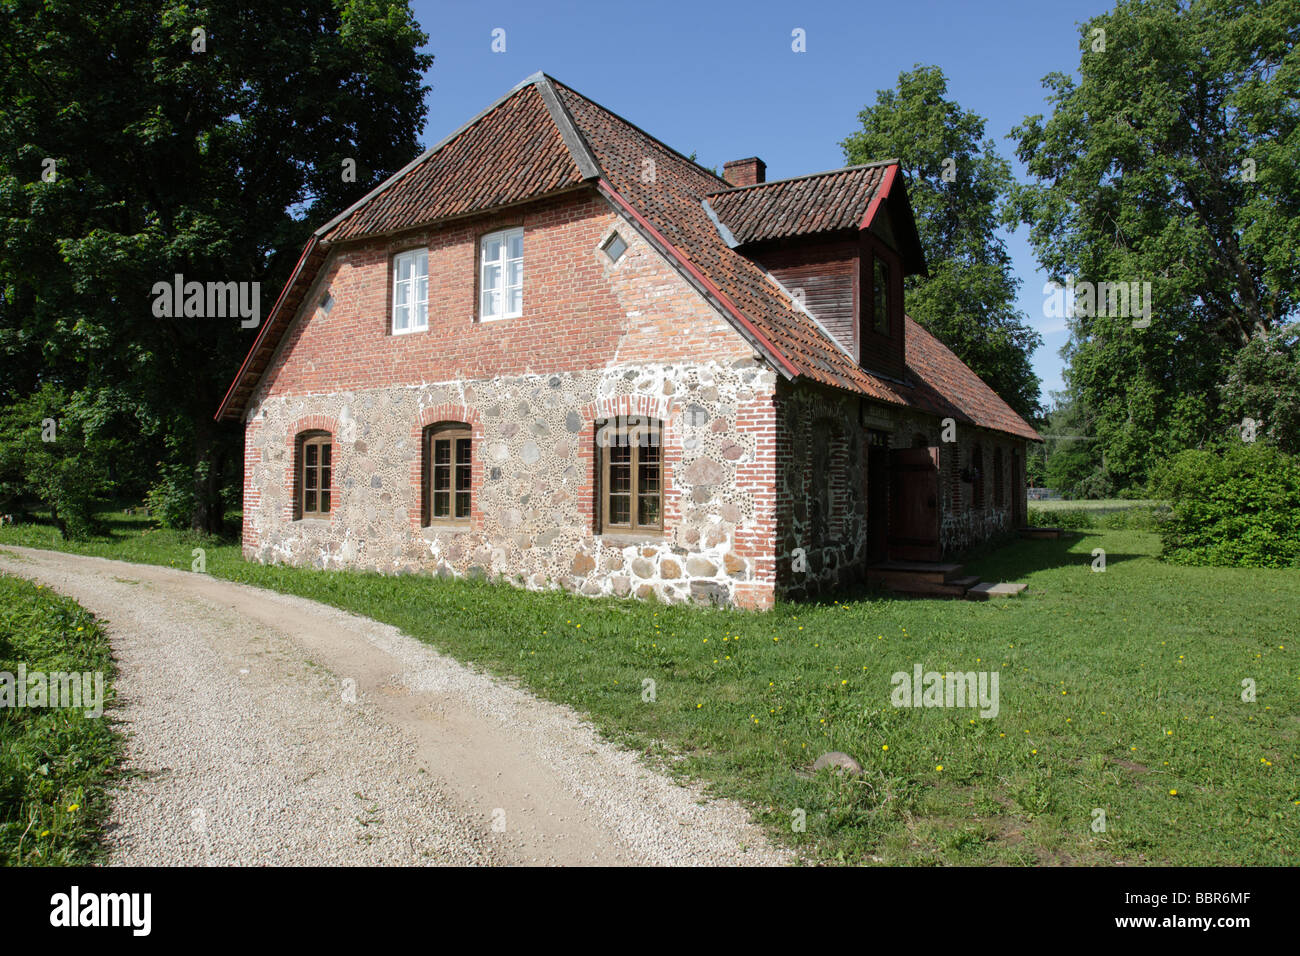 traditional house, museum at Heimtali near Viljandi, Estonia, Baltic Nation, Eastern Europe. Photo by Willy Matheisl - Stock Image